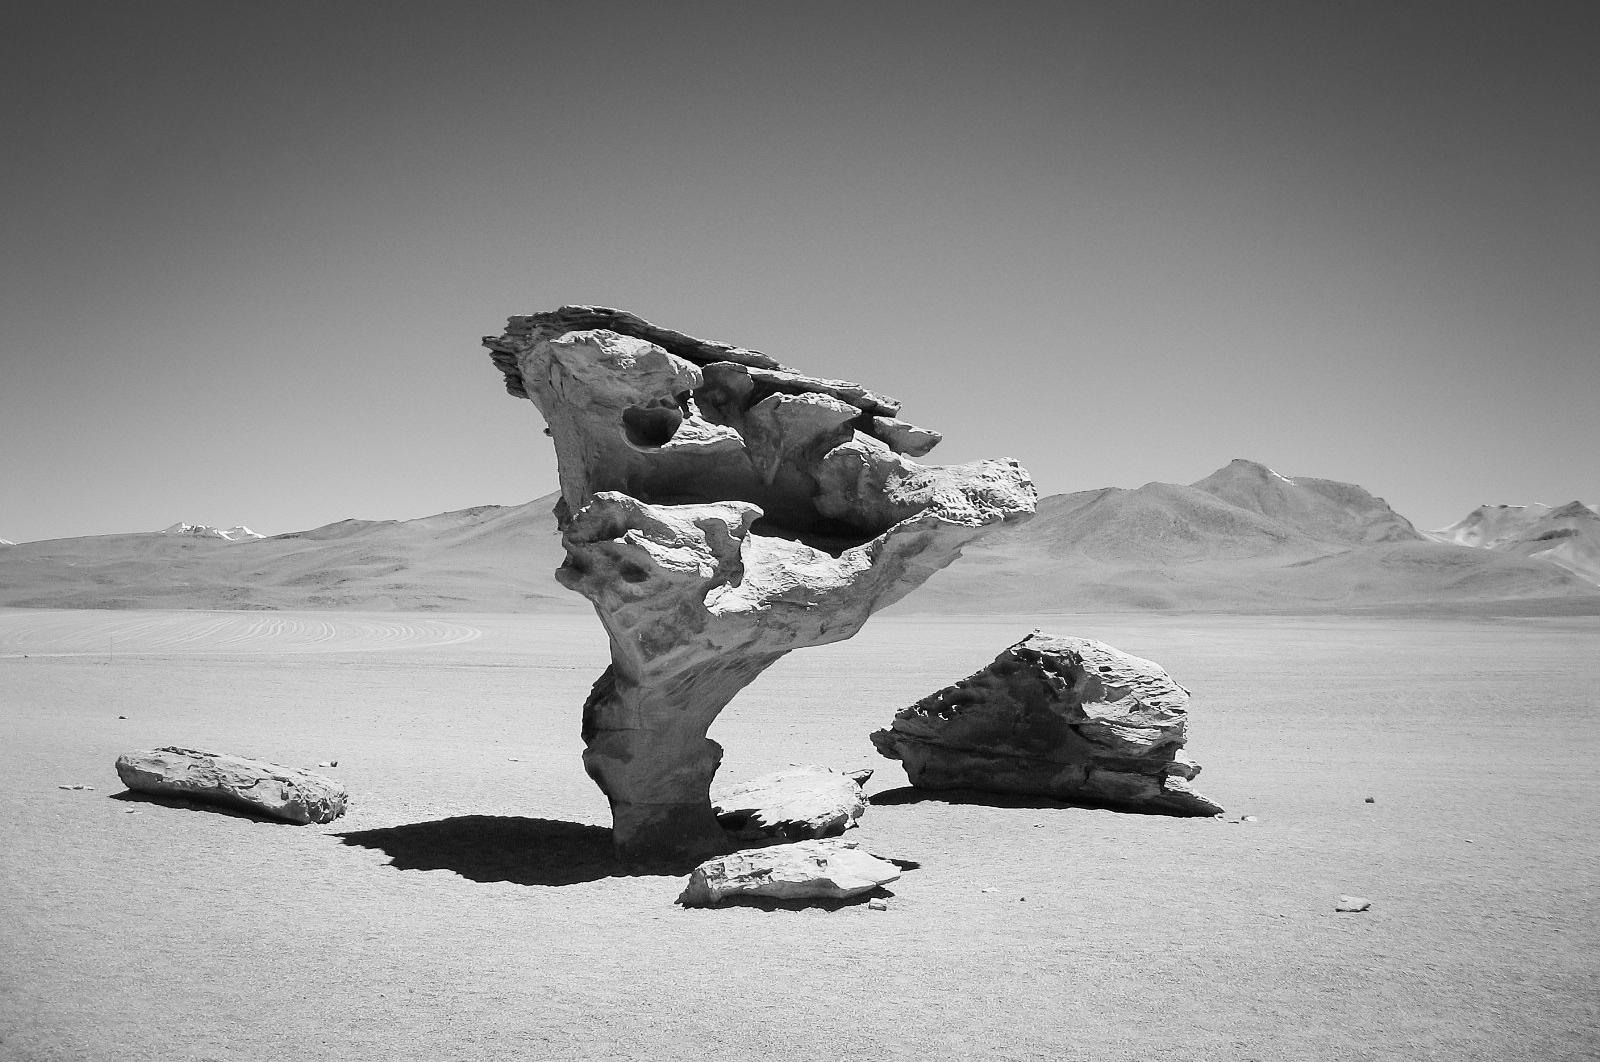 uyuni_salt-flats_day2-8872-_tornado-rock-form.jpg